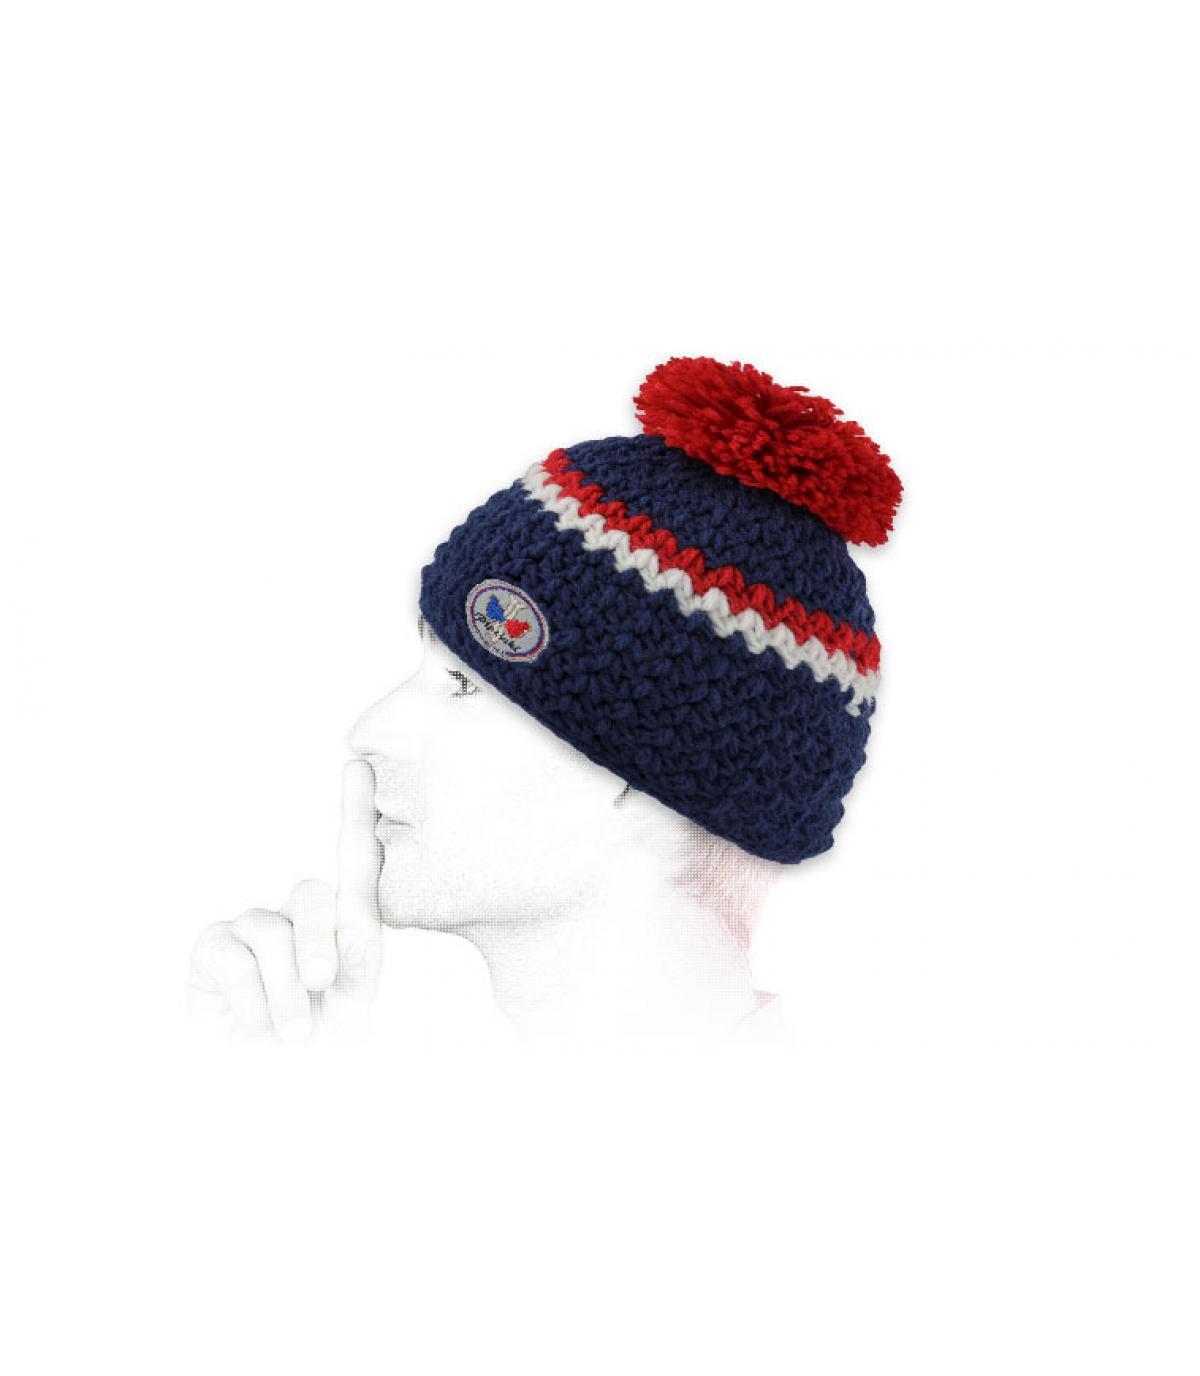 Mütze blau weiß rot Bommelmütze